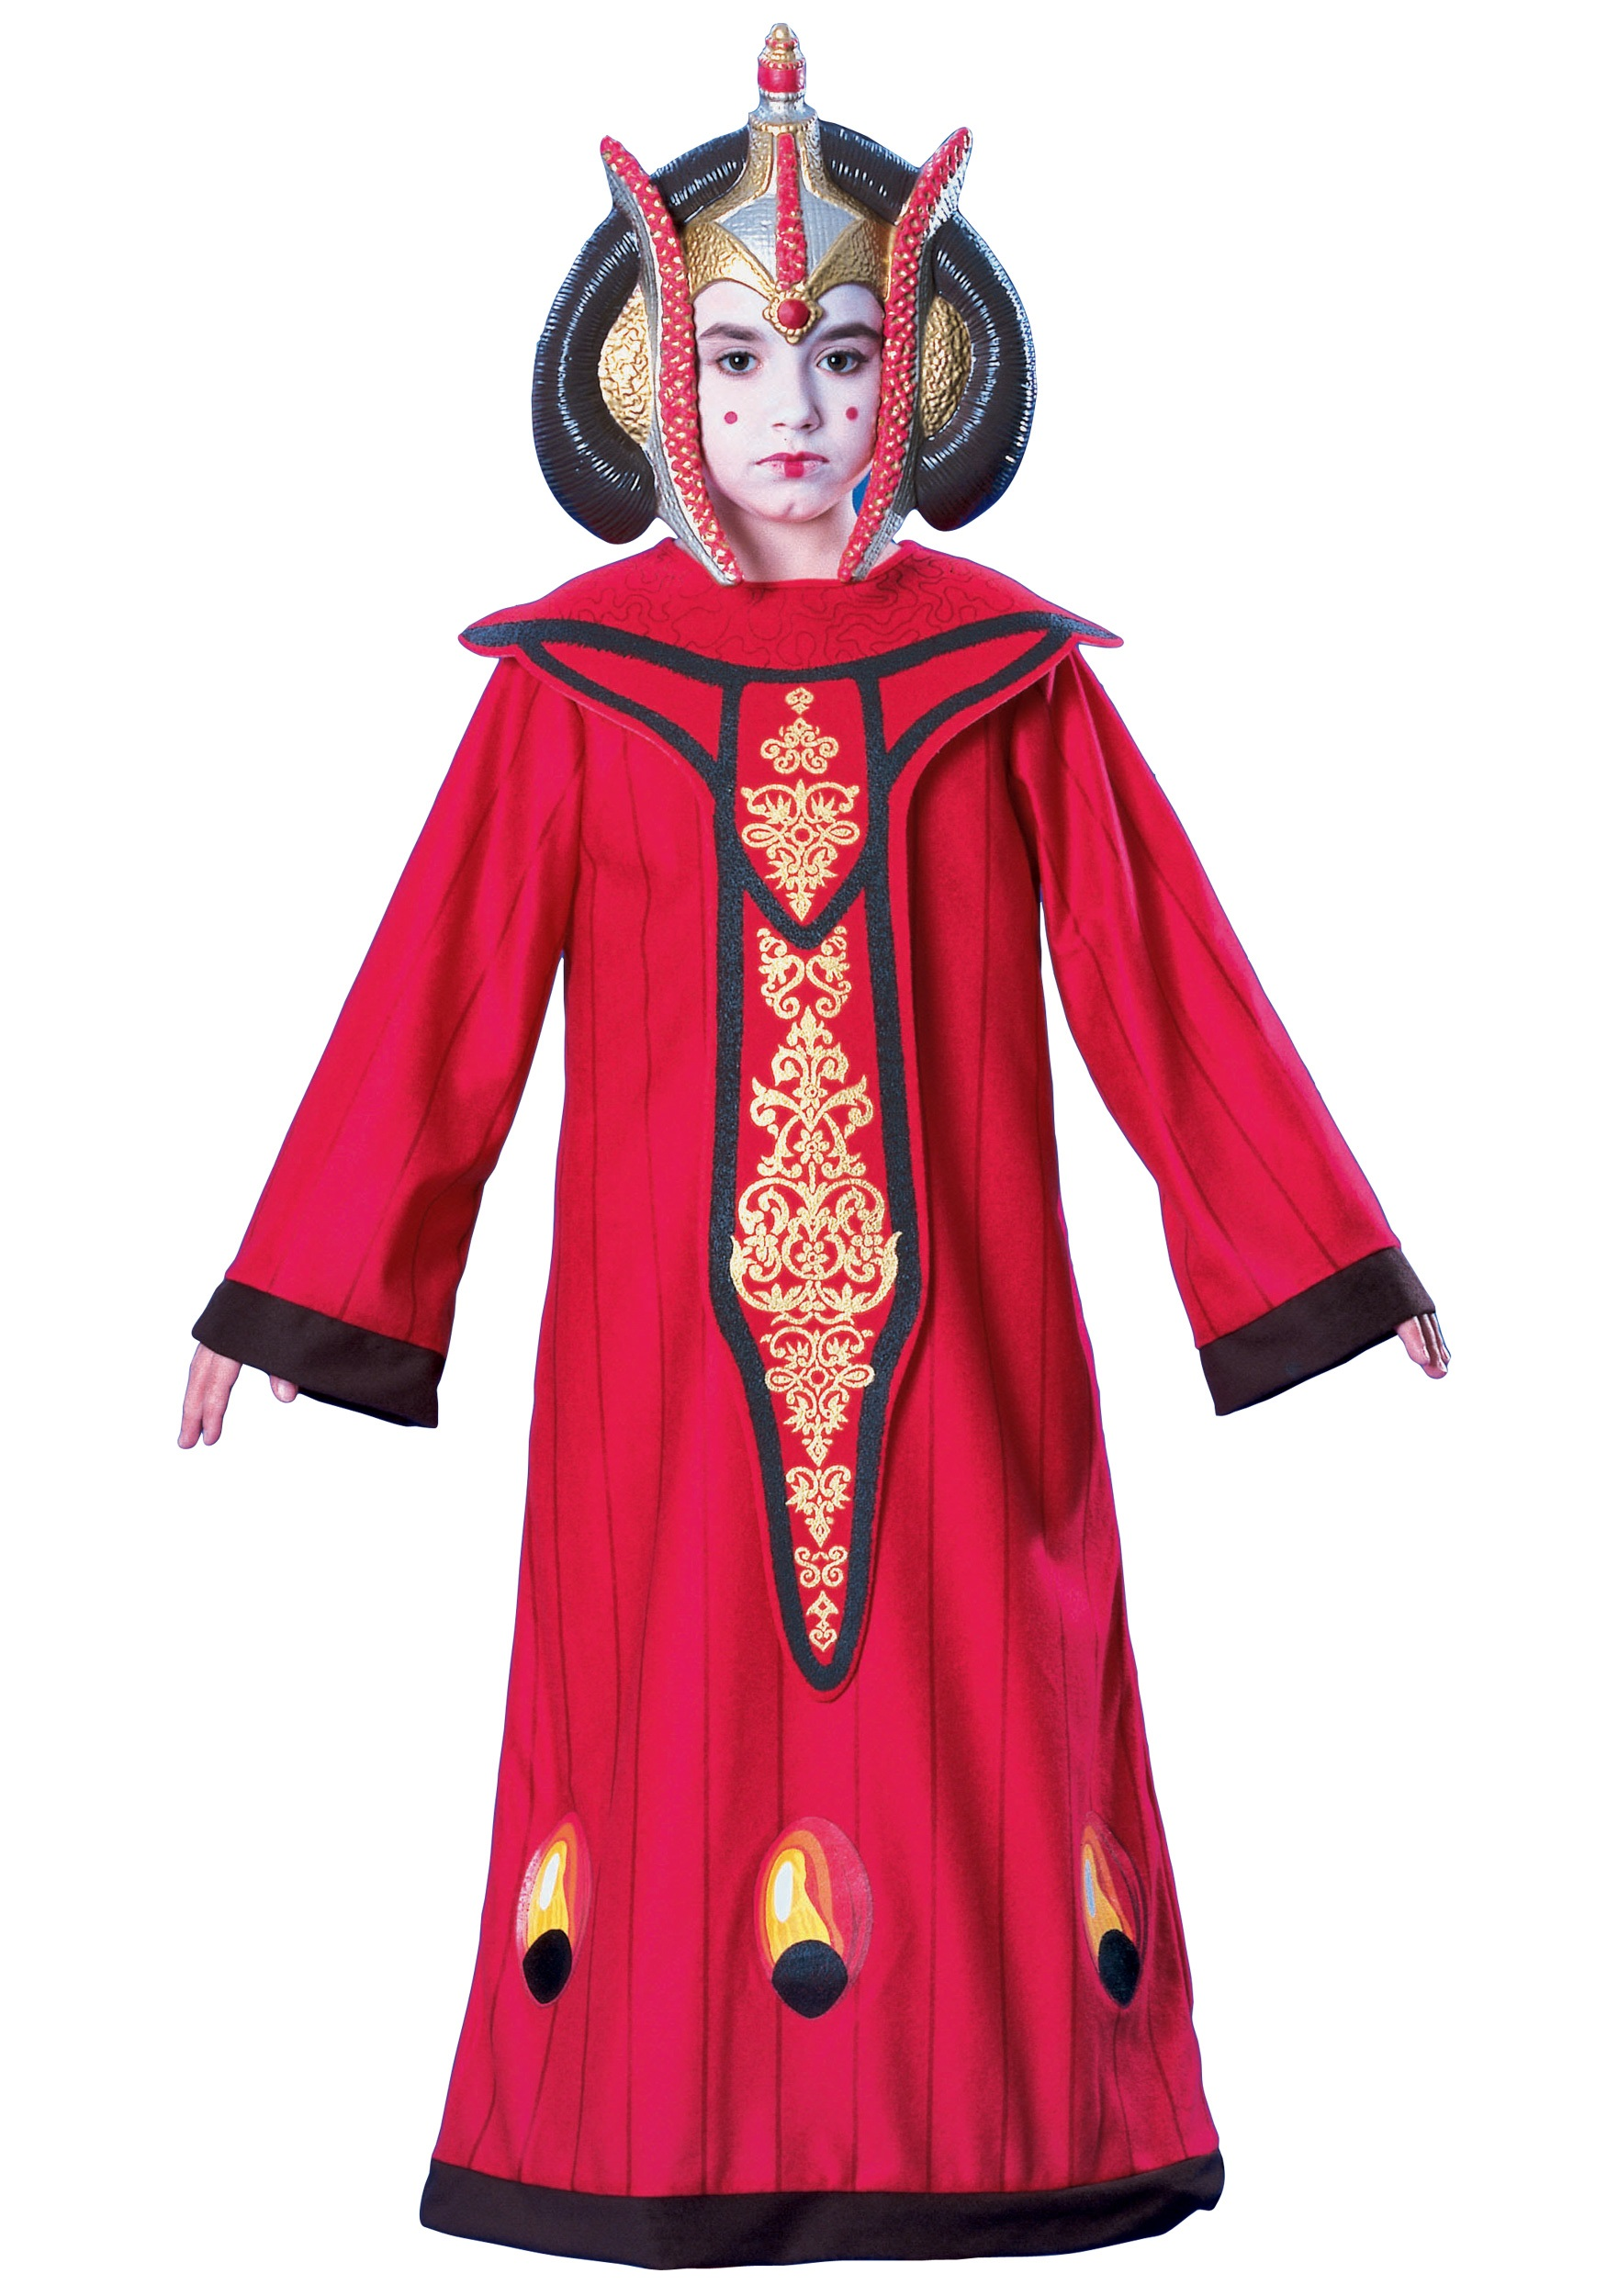 Child queen amidala costume - Princesse amidala star wars ...